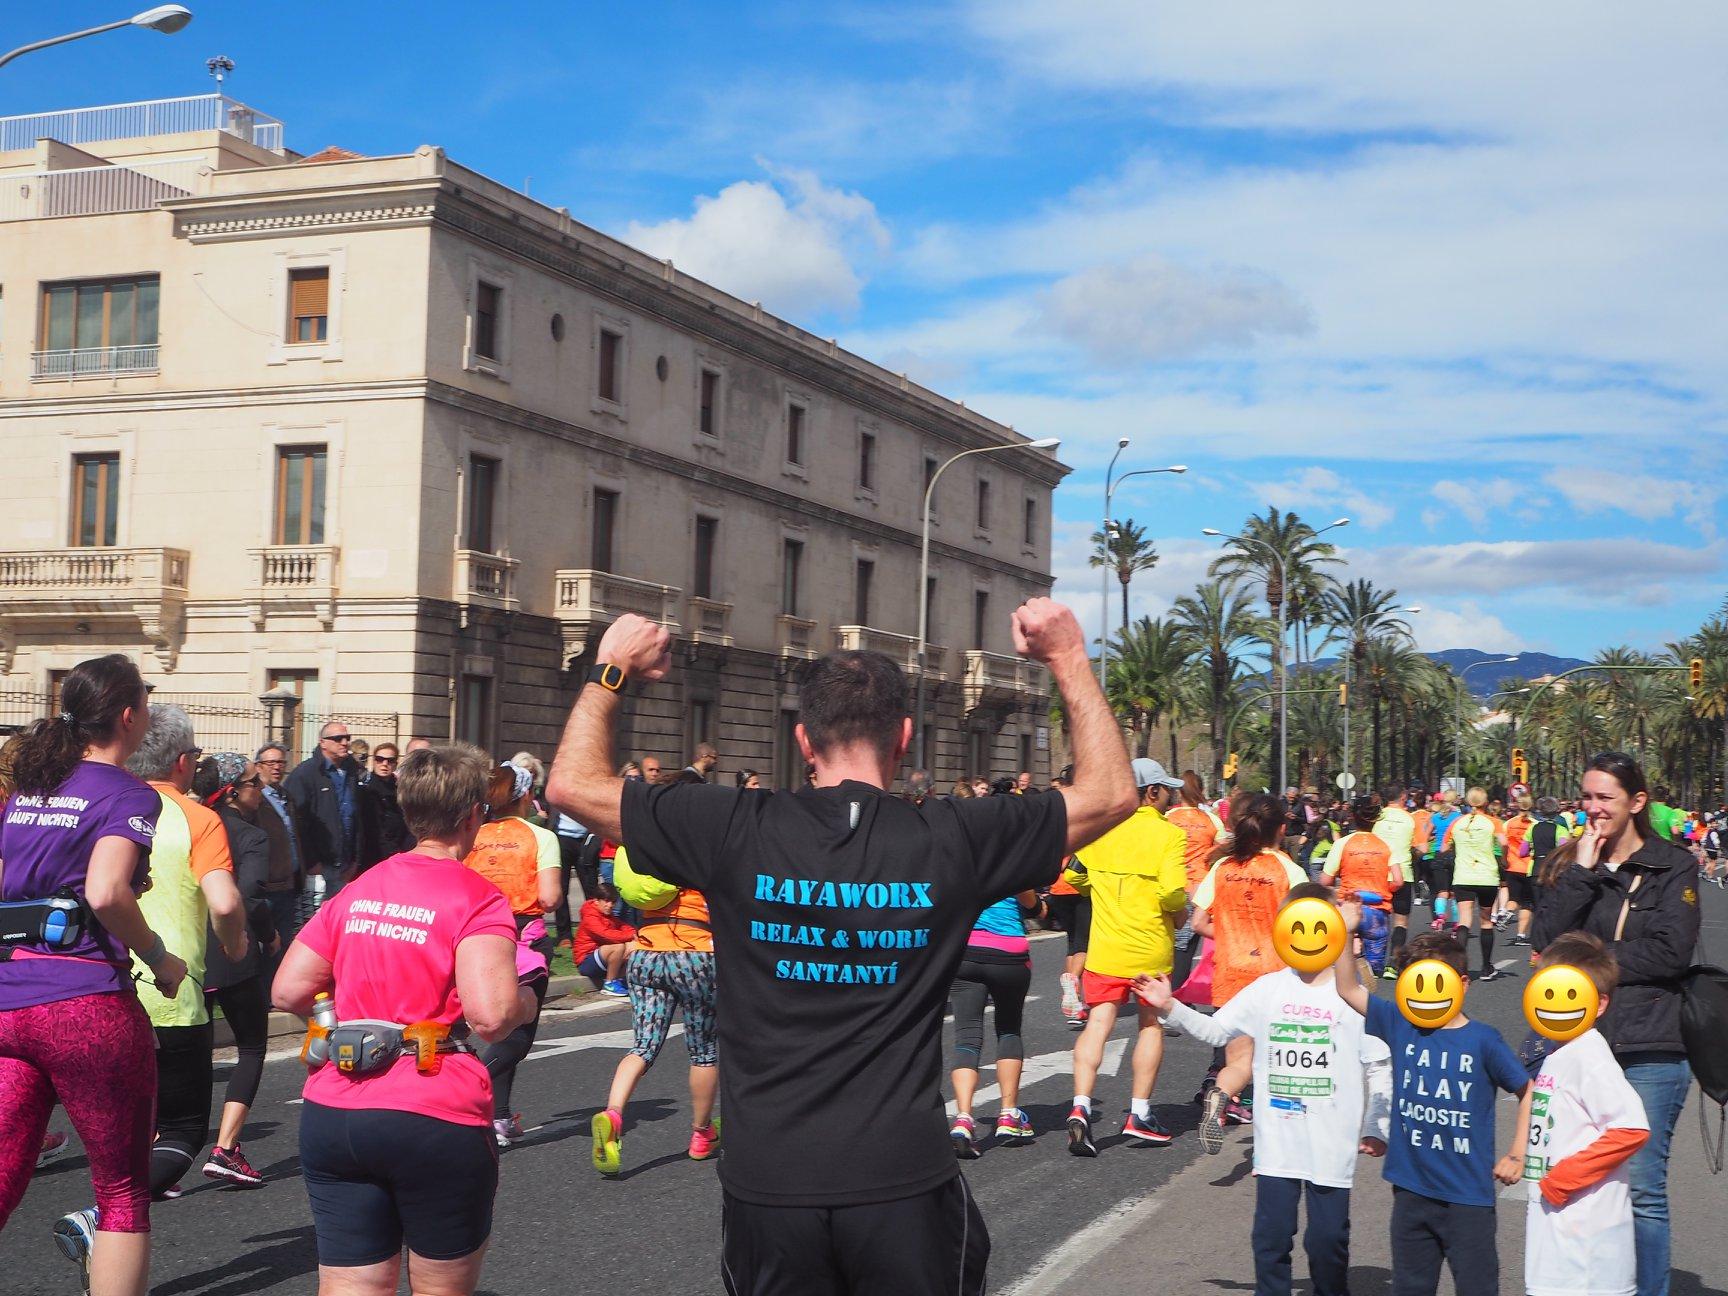 Half Marathon Palma de Mallorca: Team Rayaworx